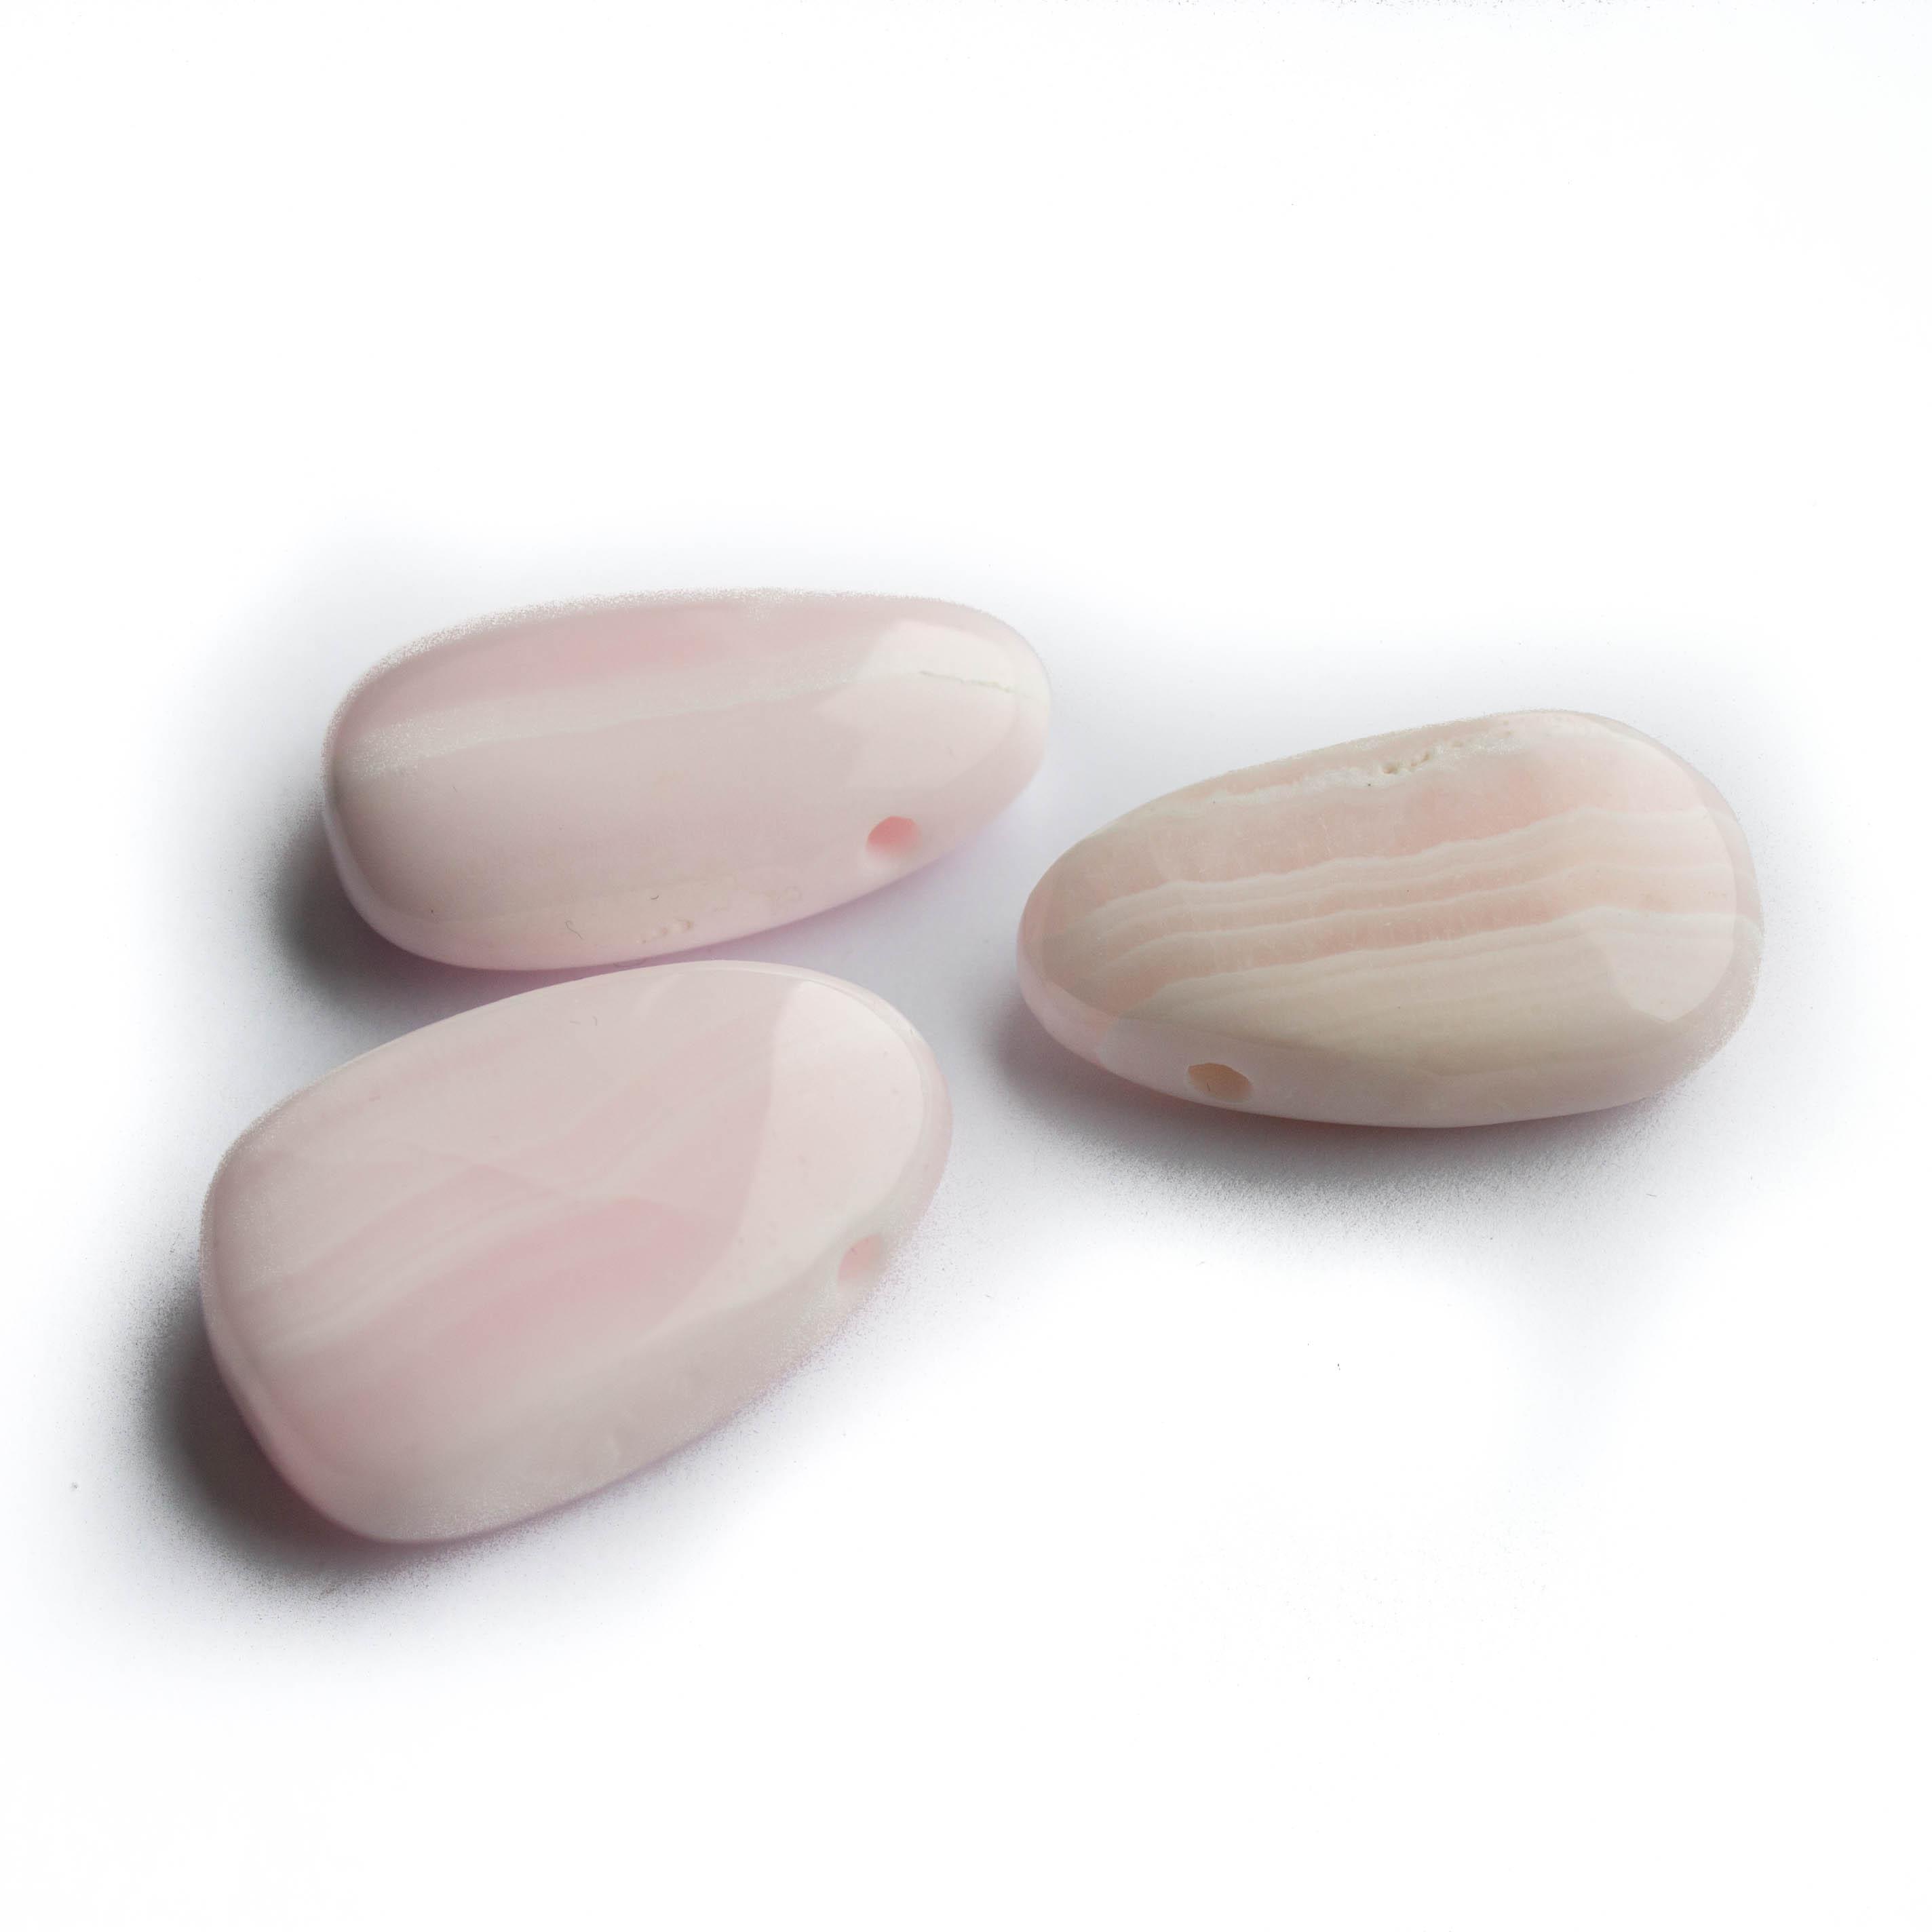 Mangano-kaltsiit, roosa